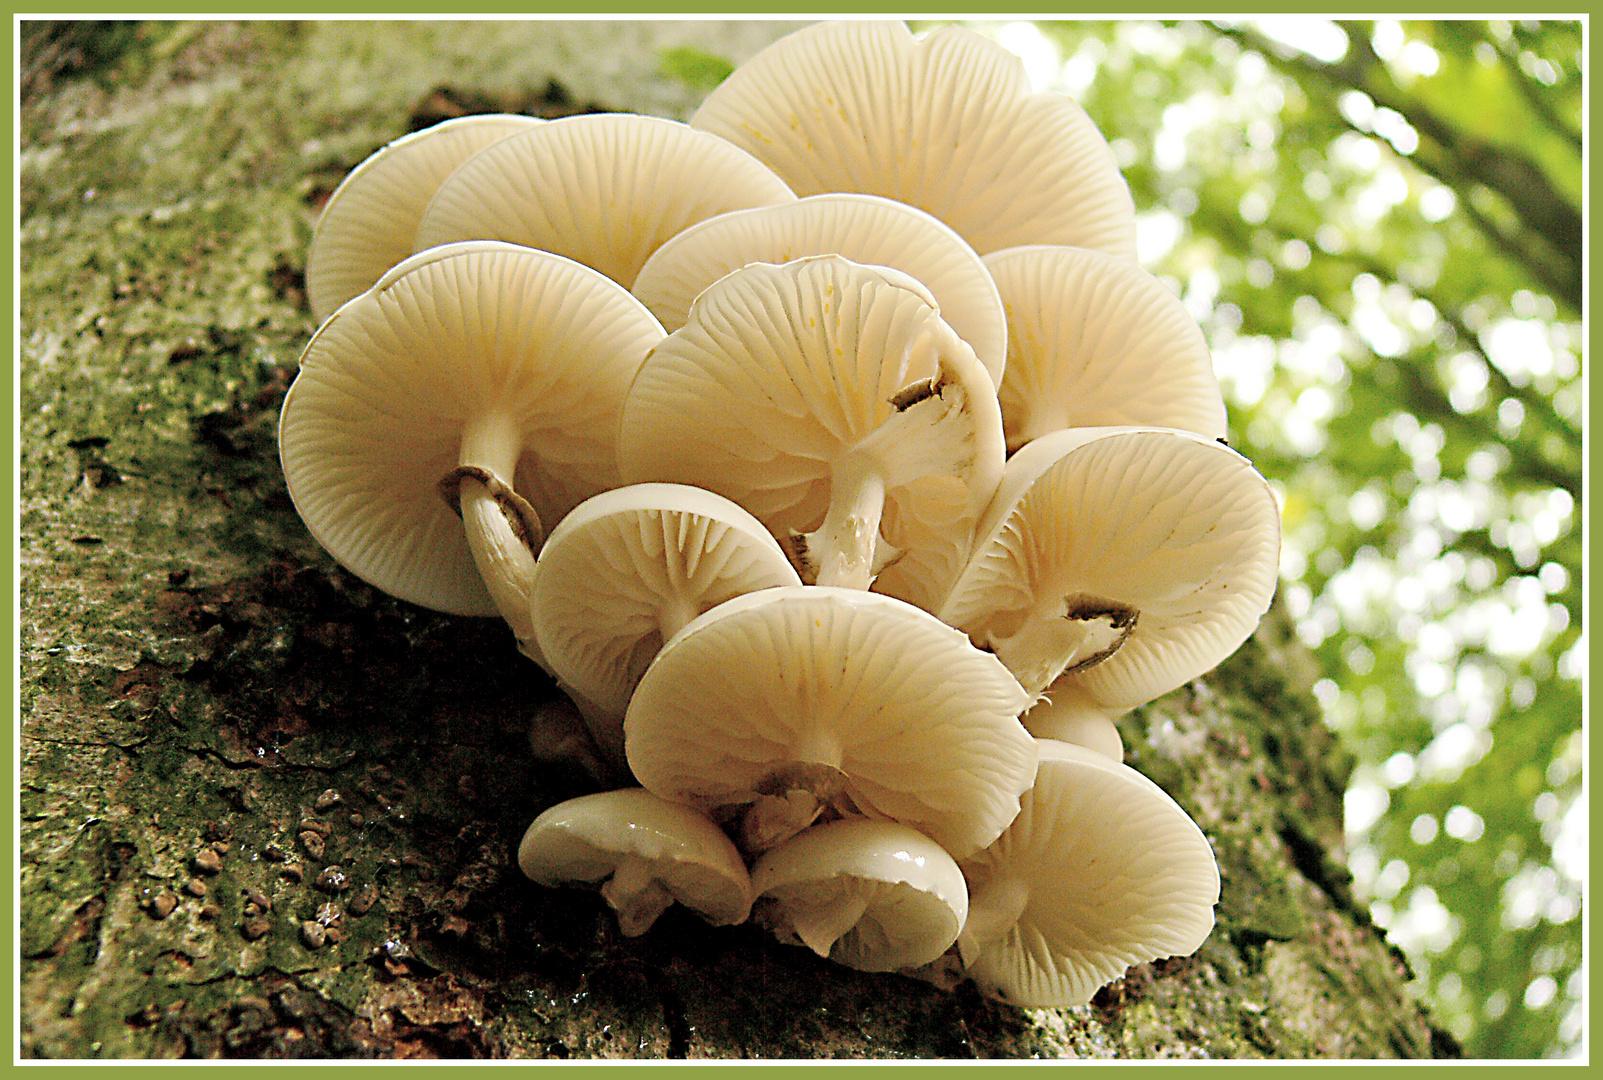 Faszination Pilze